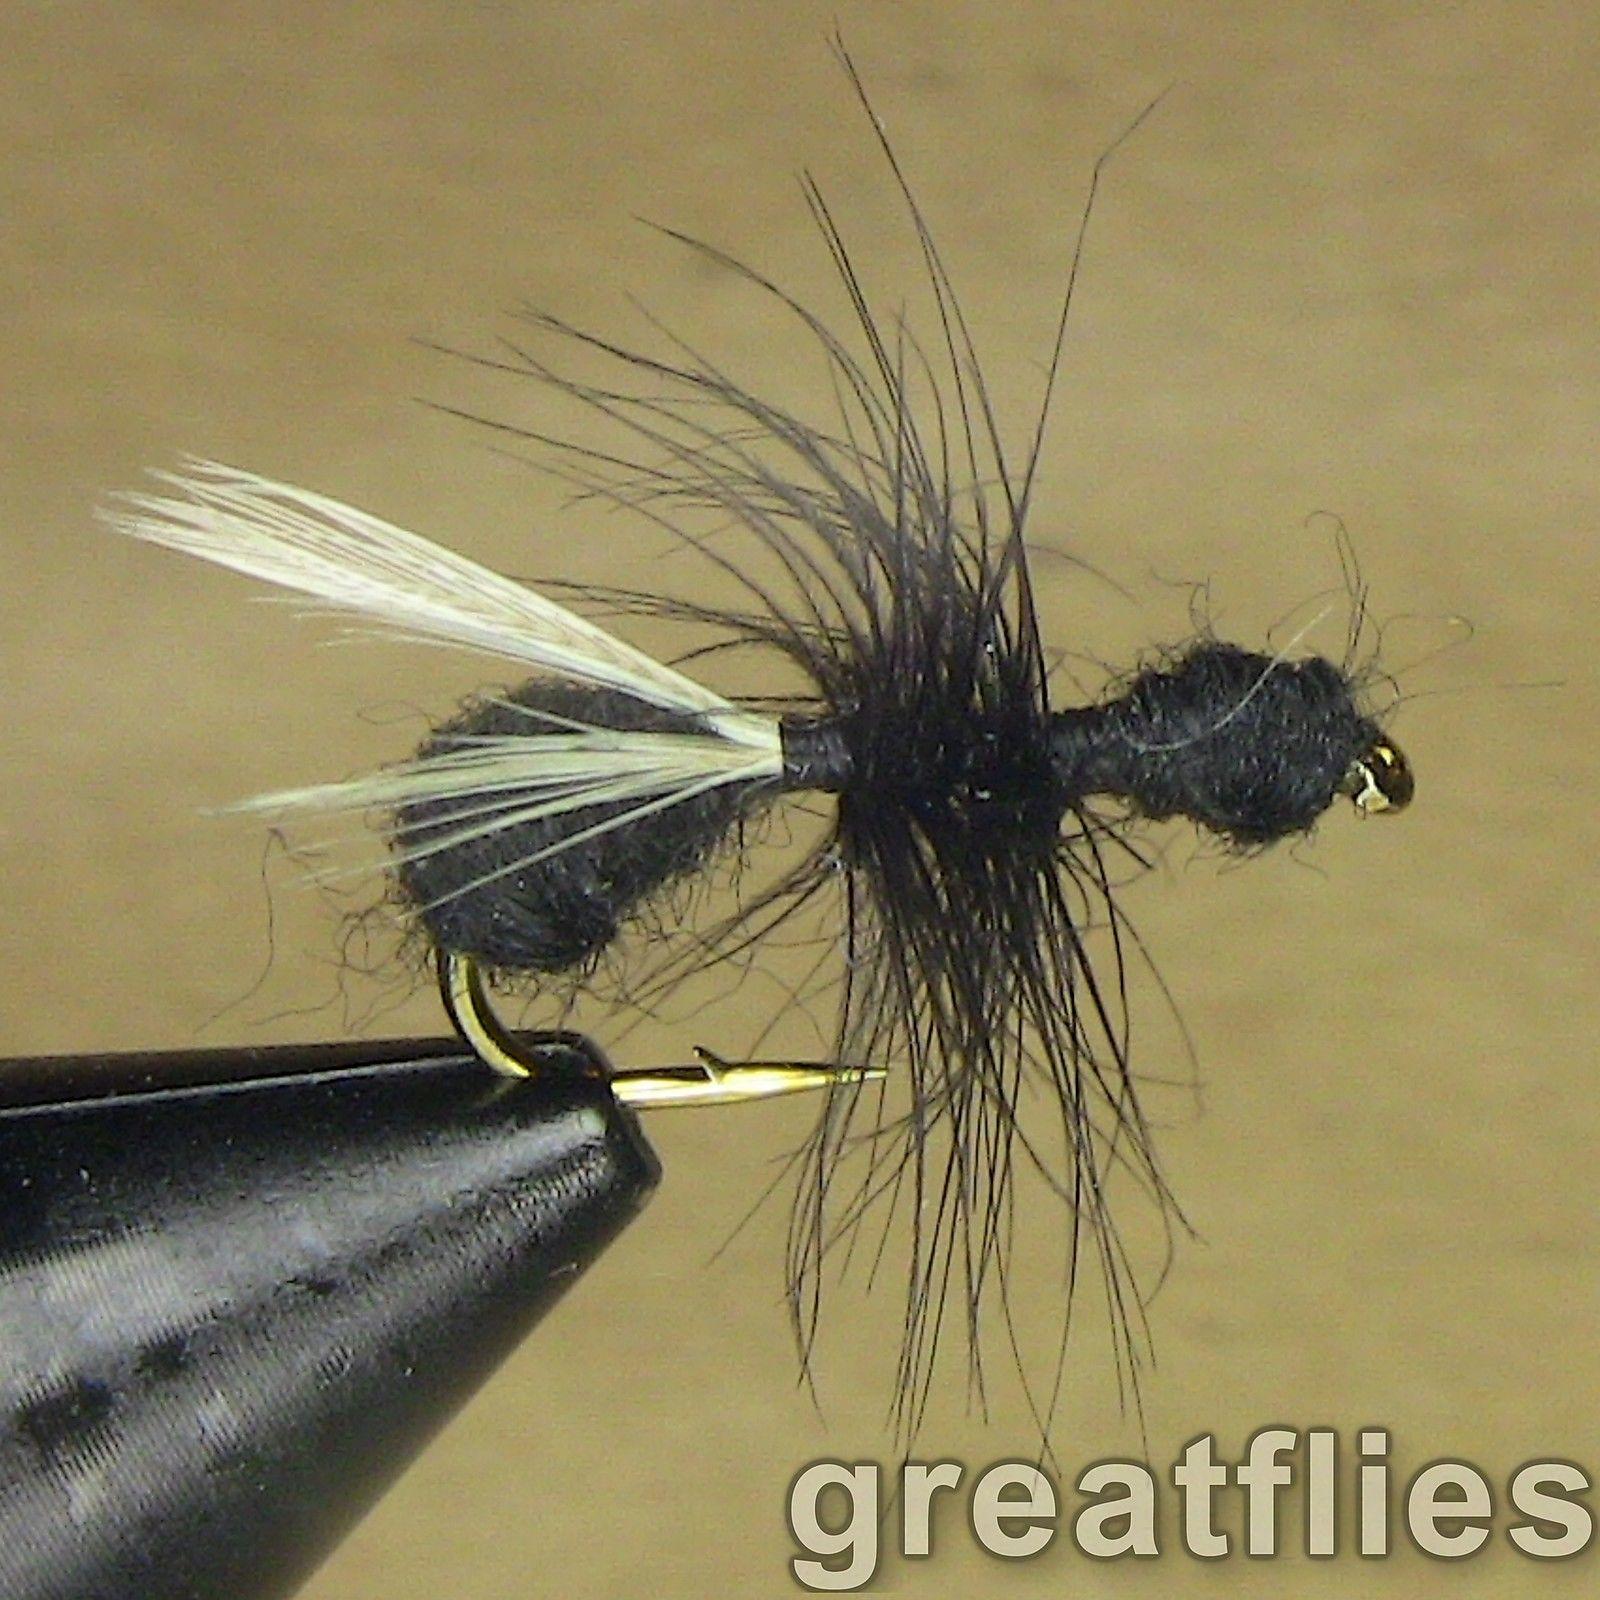 1 dozen Parachute Grasshopper - Para Hopper - TAN 12